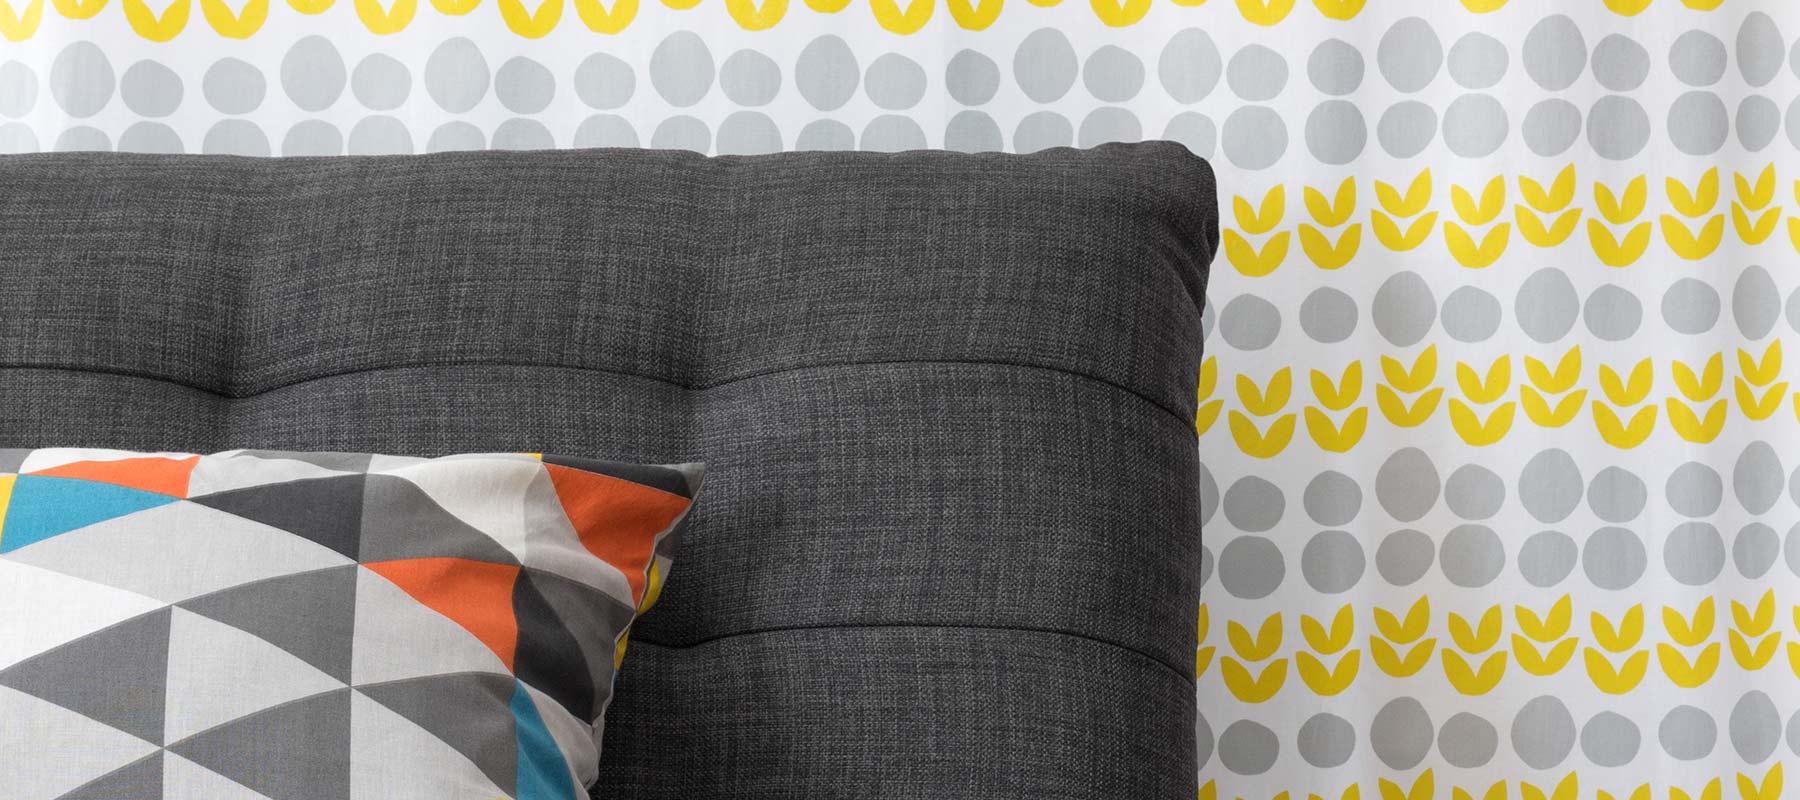 Home Textiles - DyStar